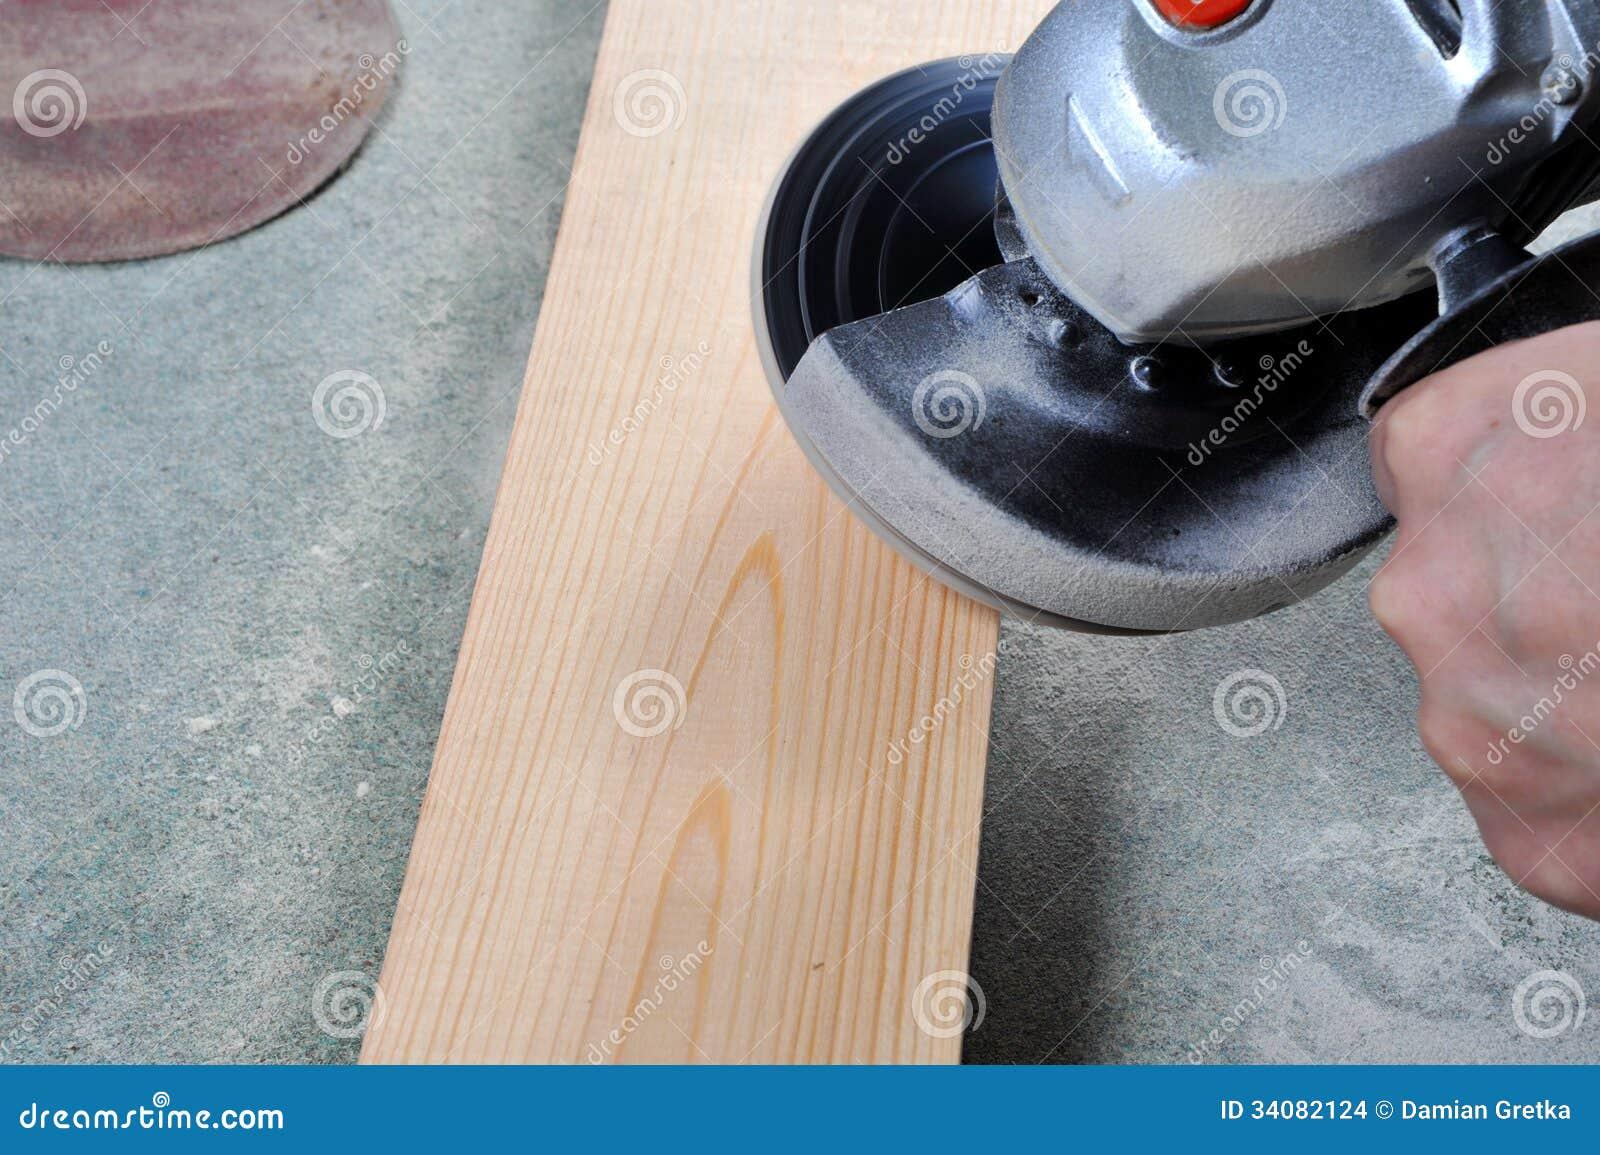 Wood Craft In Grinder